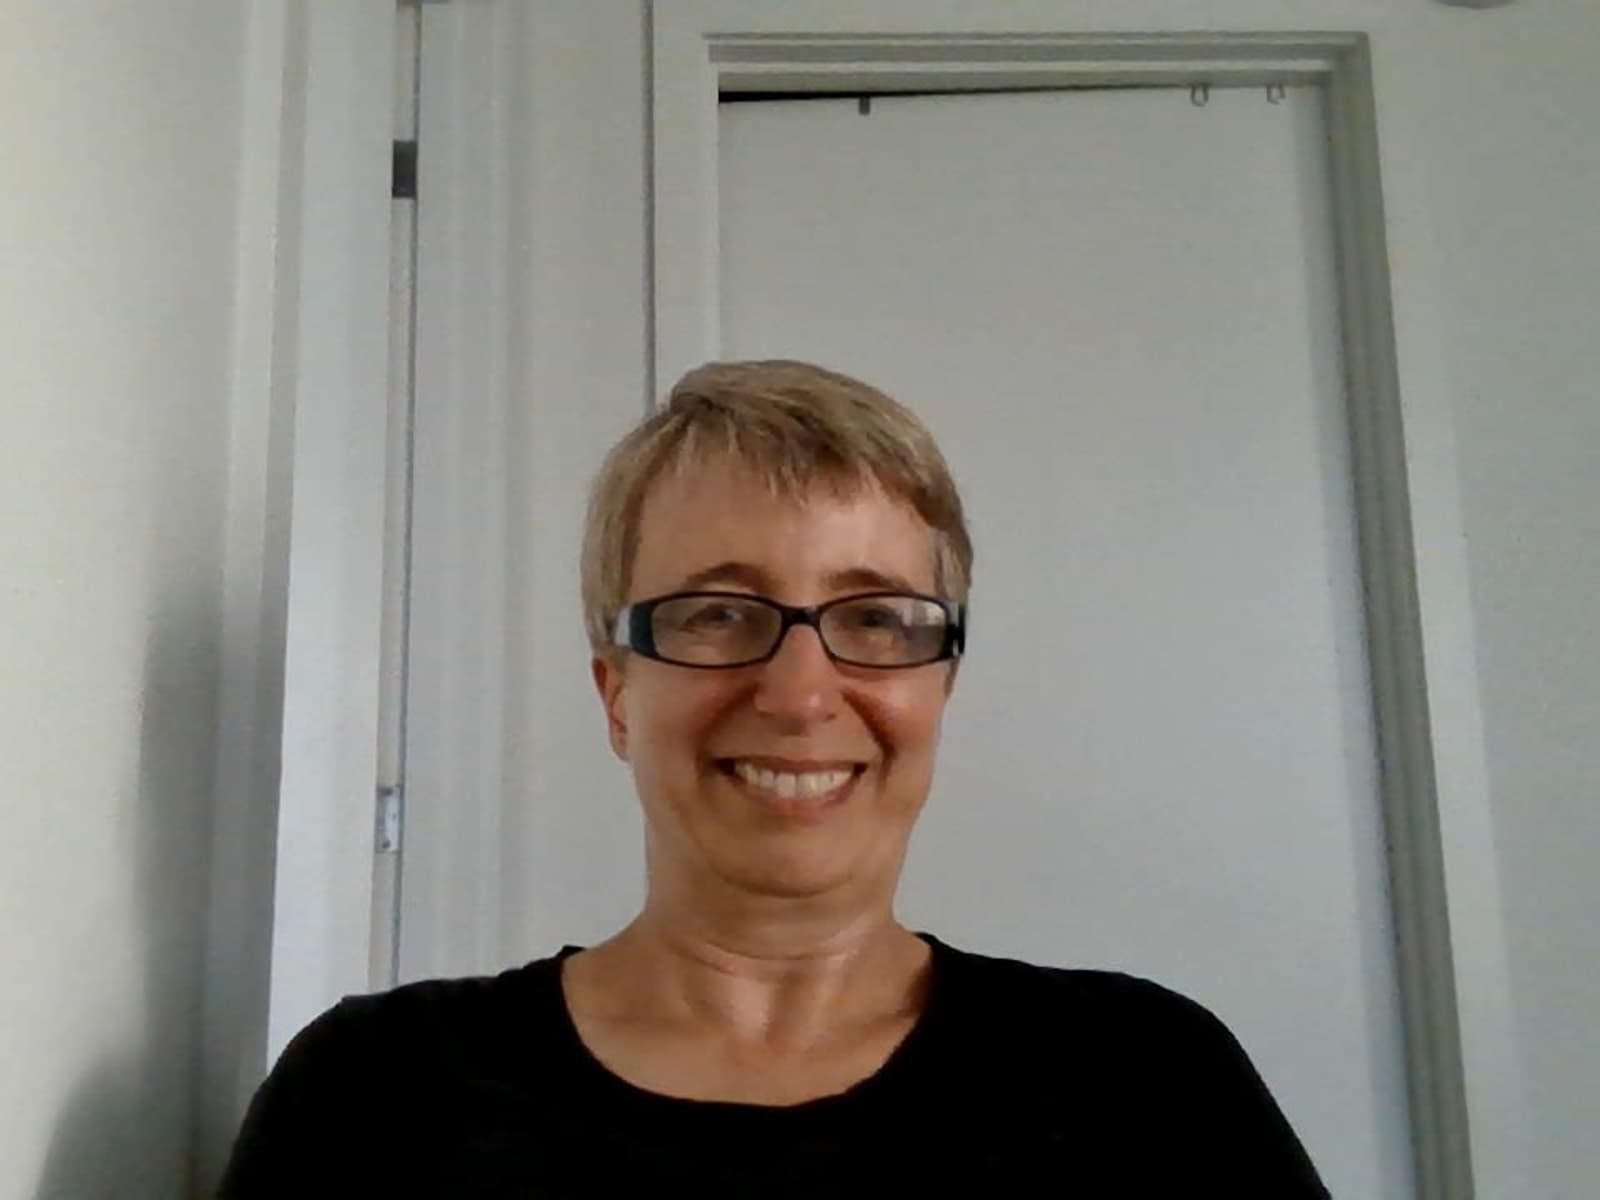 Elizabeth from Portland, Oregon, United States